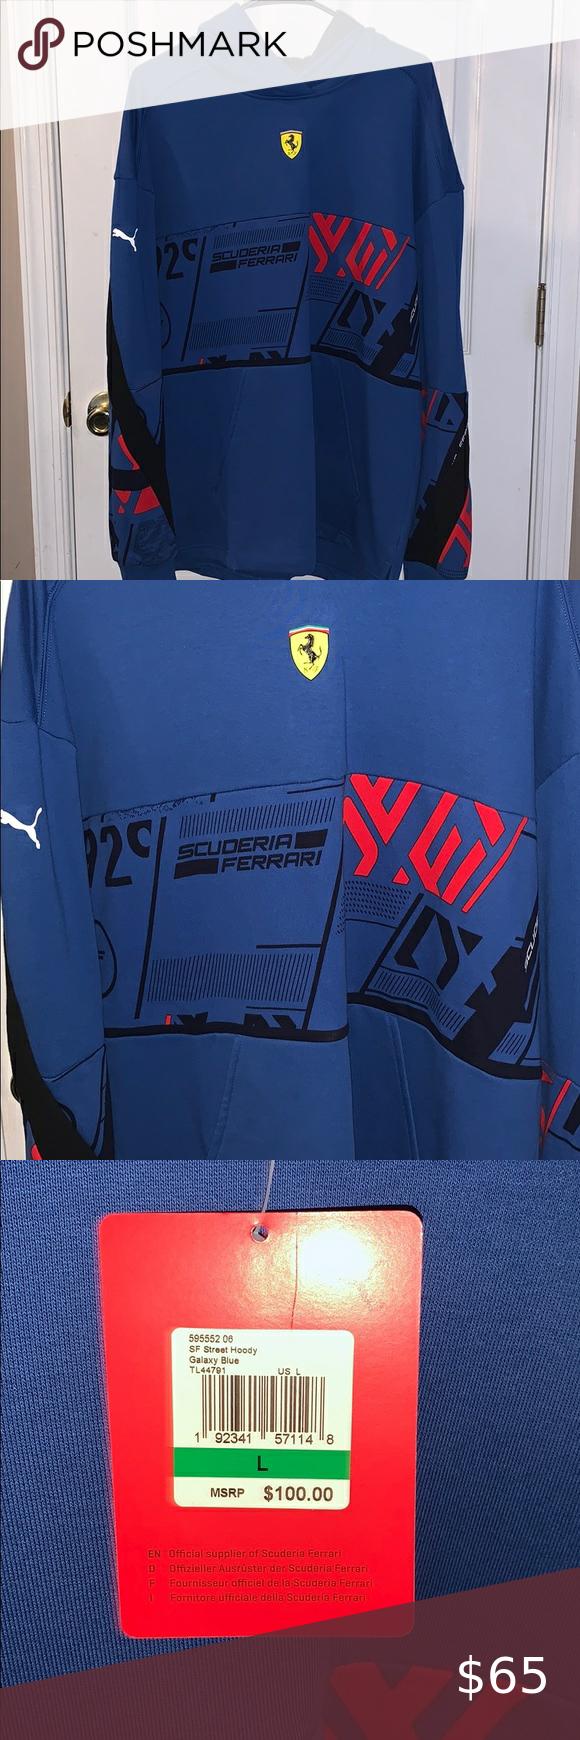 Brand New Puma Ferrari Hoodie Hoodie Brands Sweatshirt Shirt Puma Shirts